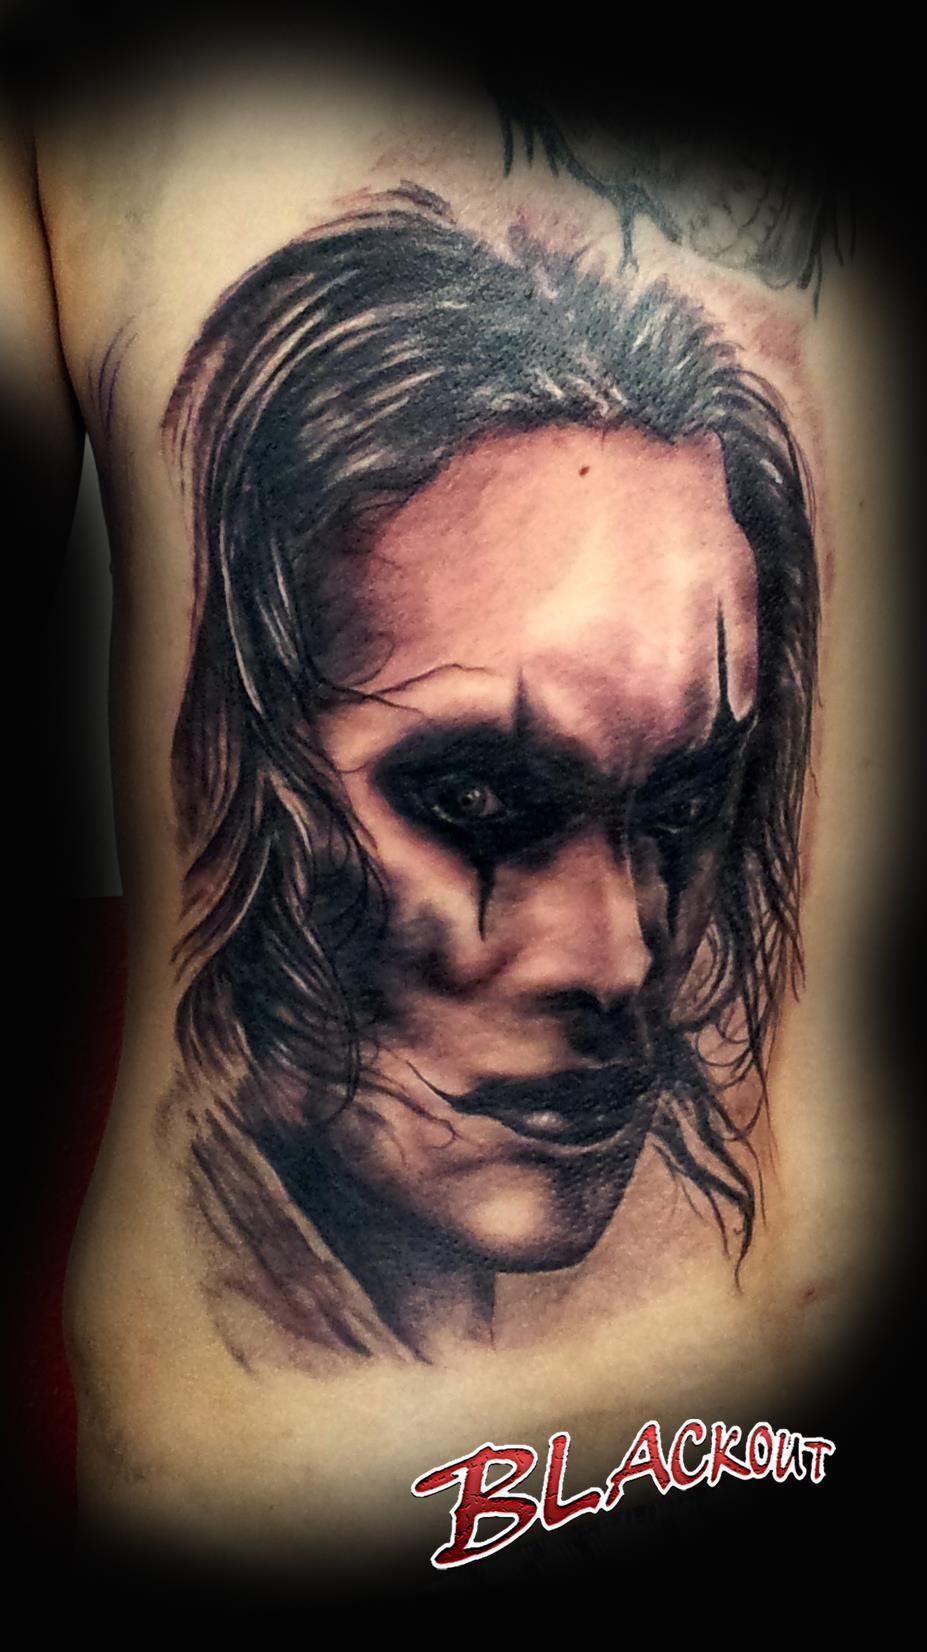 Blackout Tattoo Görlitz